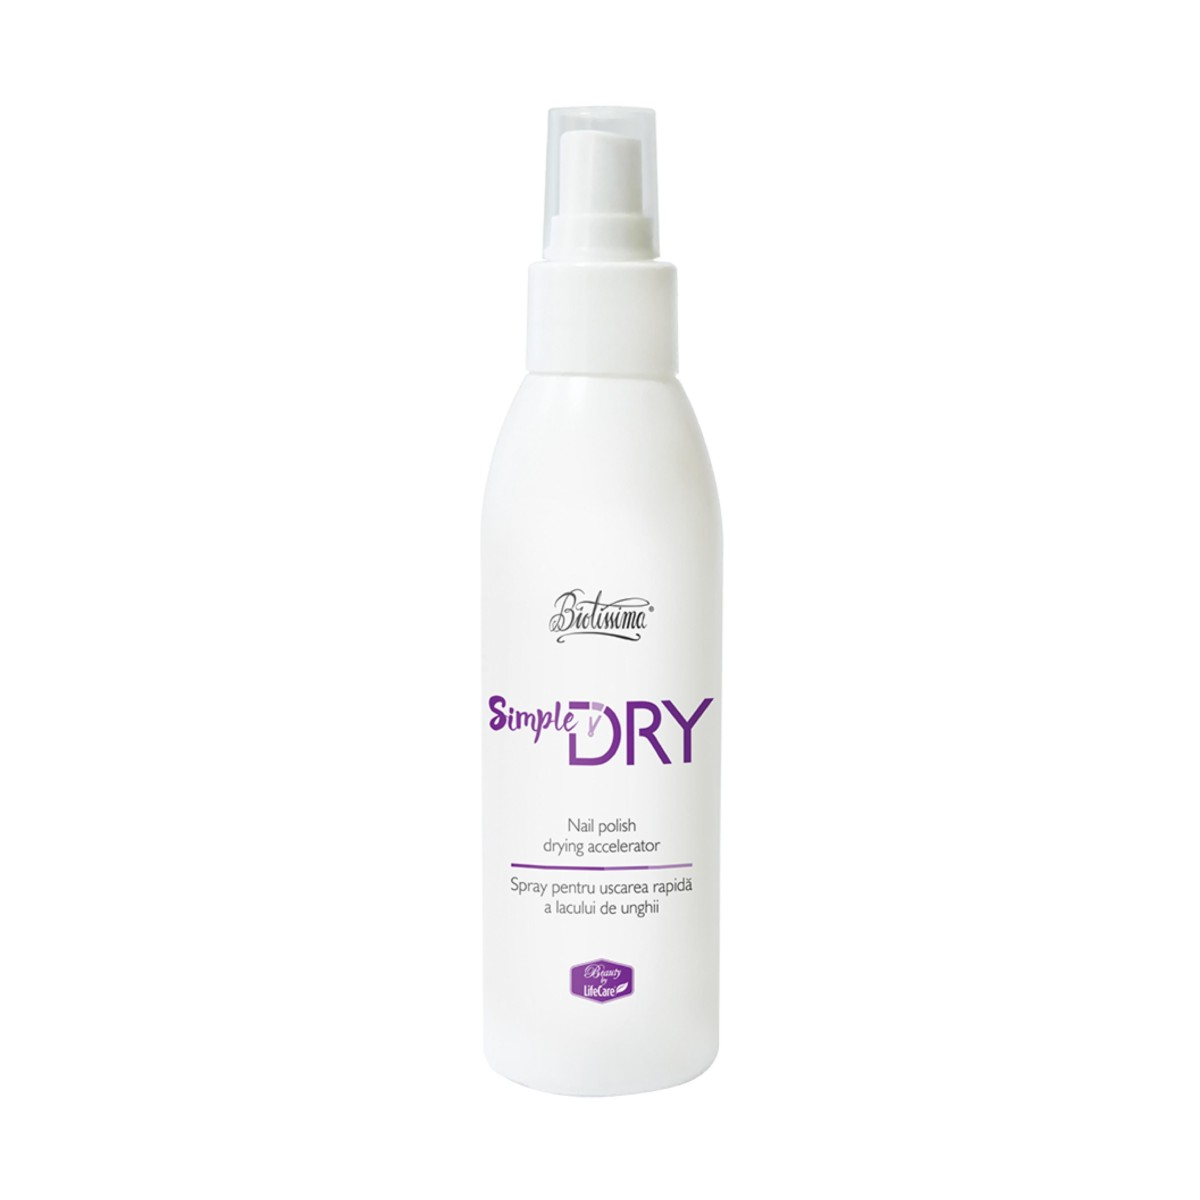 spray-uscare-rapida-simple-dry-biotissima